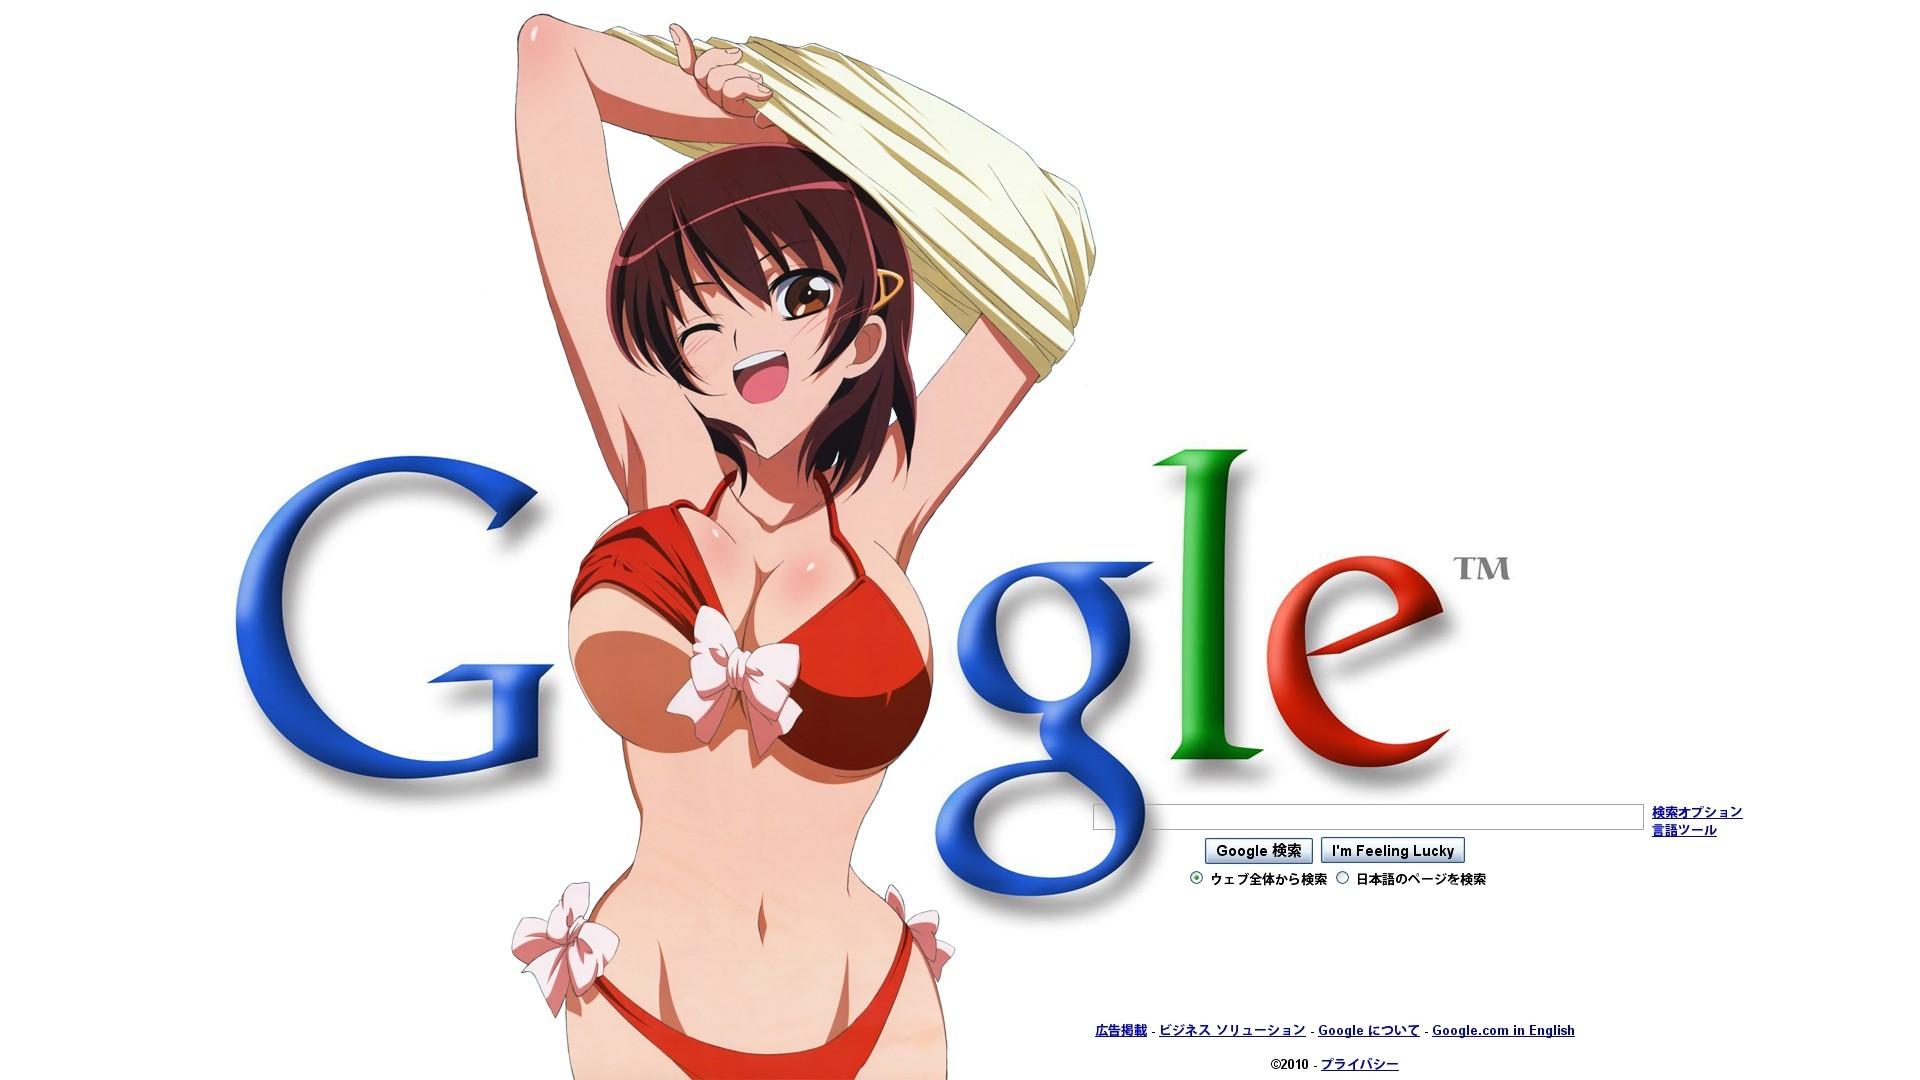 Anime 1920x1080 anime girls swimwear bikini Google Kamen no Maid Guy boobs big boobs huge breasts open mouth belly one eye closed 2010 (Year) arms up armpits brown eyes brunette